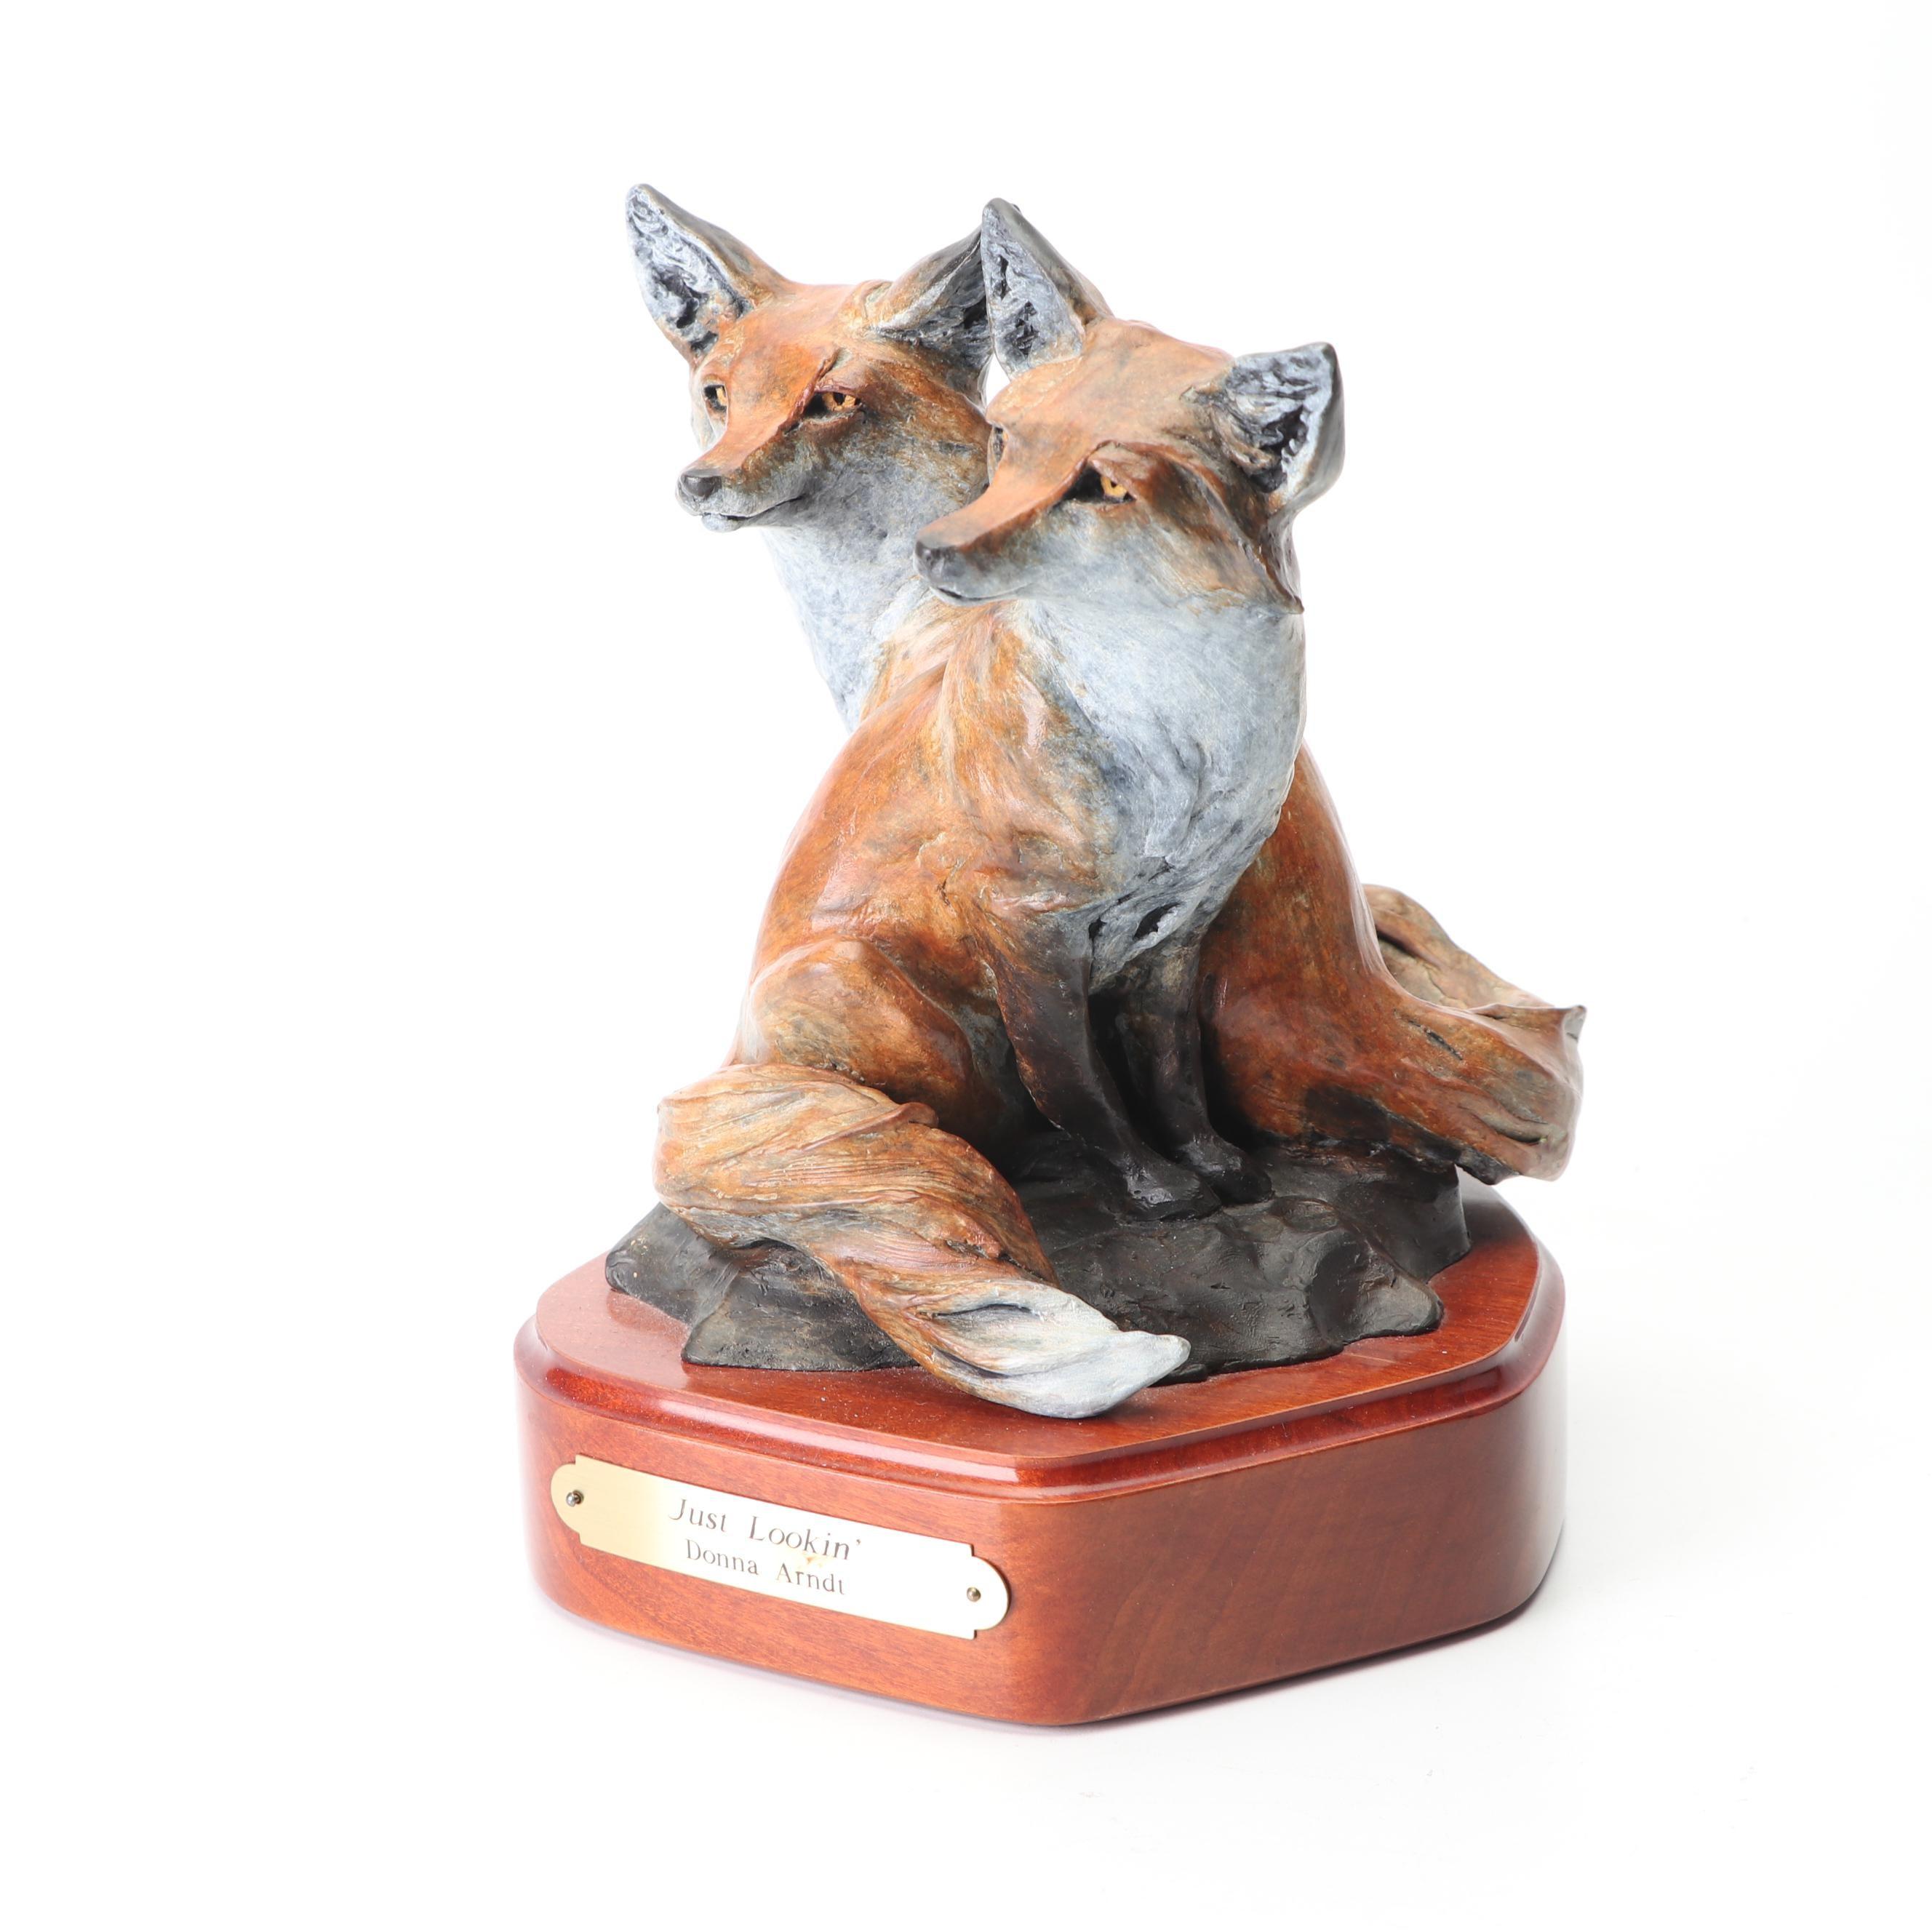 "Donna Arndt Sculpture ""Just Lookin'"""